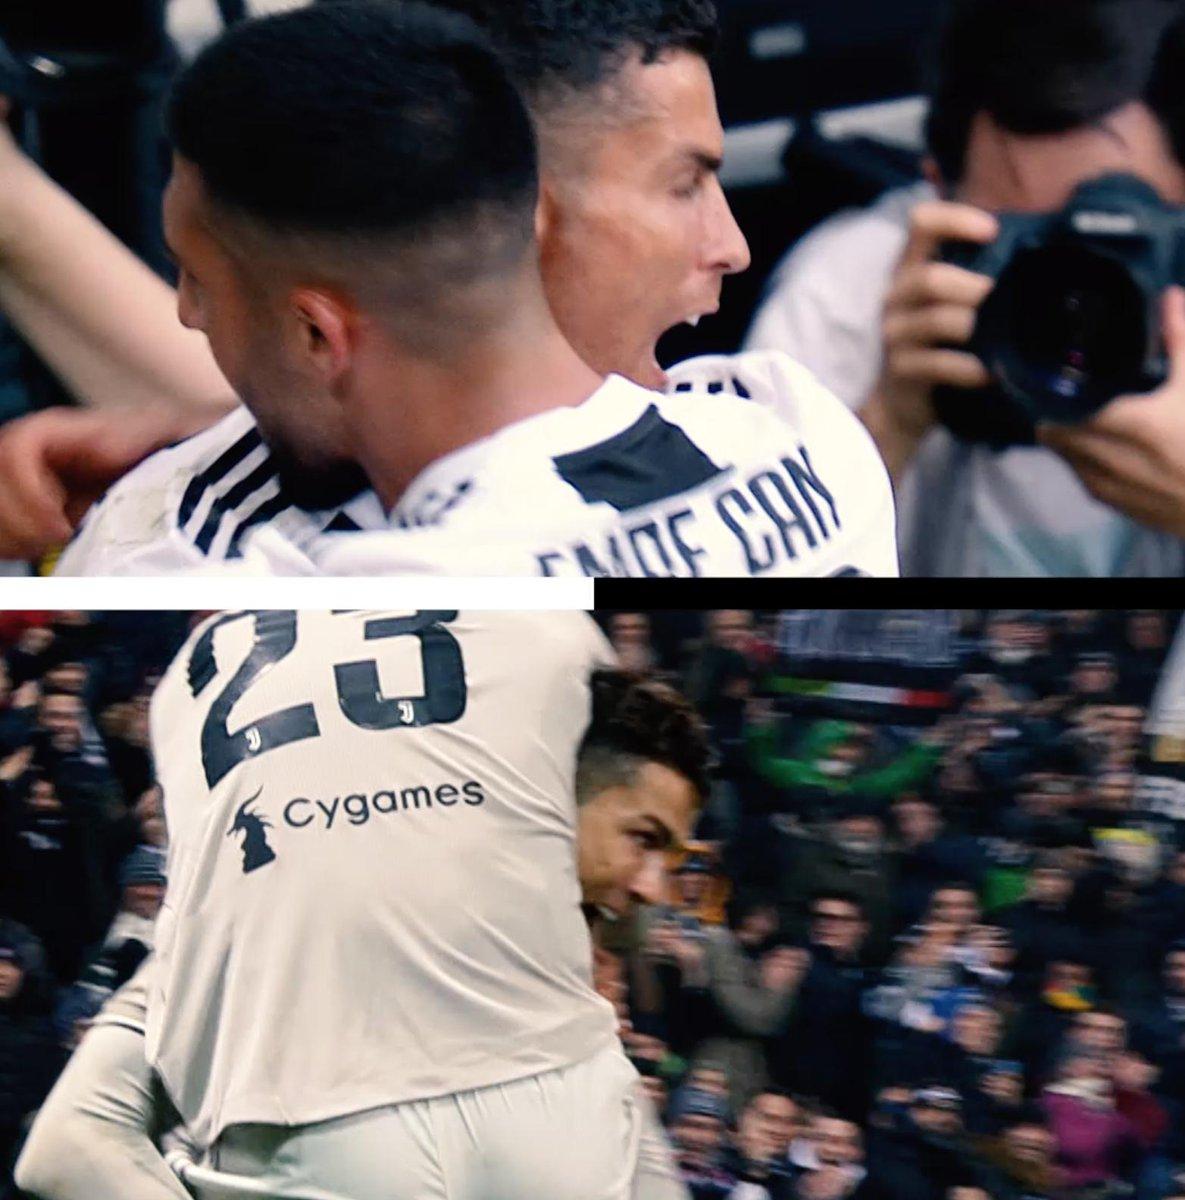 Emre Can ➡ Cristiano Ronaldo = ⚽ Cristiano Ronaldo ➡ Emre Can = ⚽ Notate qualche somiglianza all'andata e al ritorno con il Sassuolo? #ThrowBackThursday #TBT